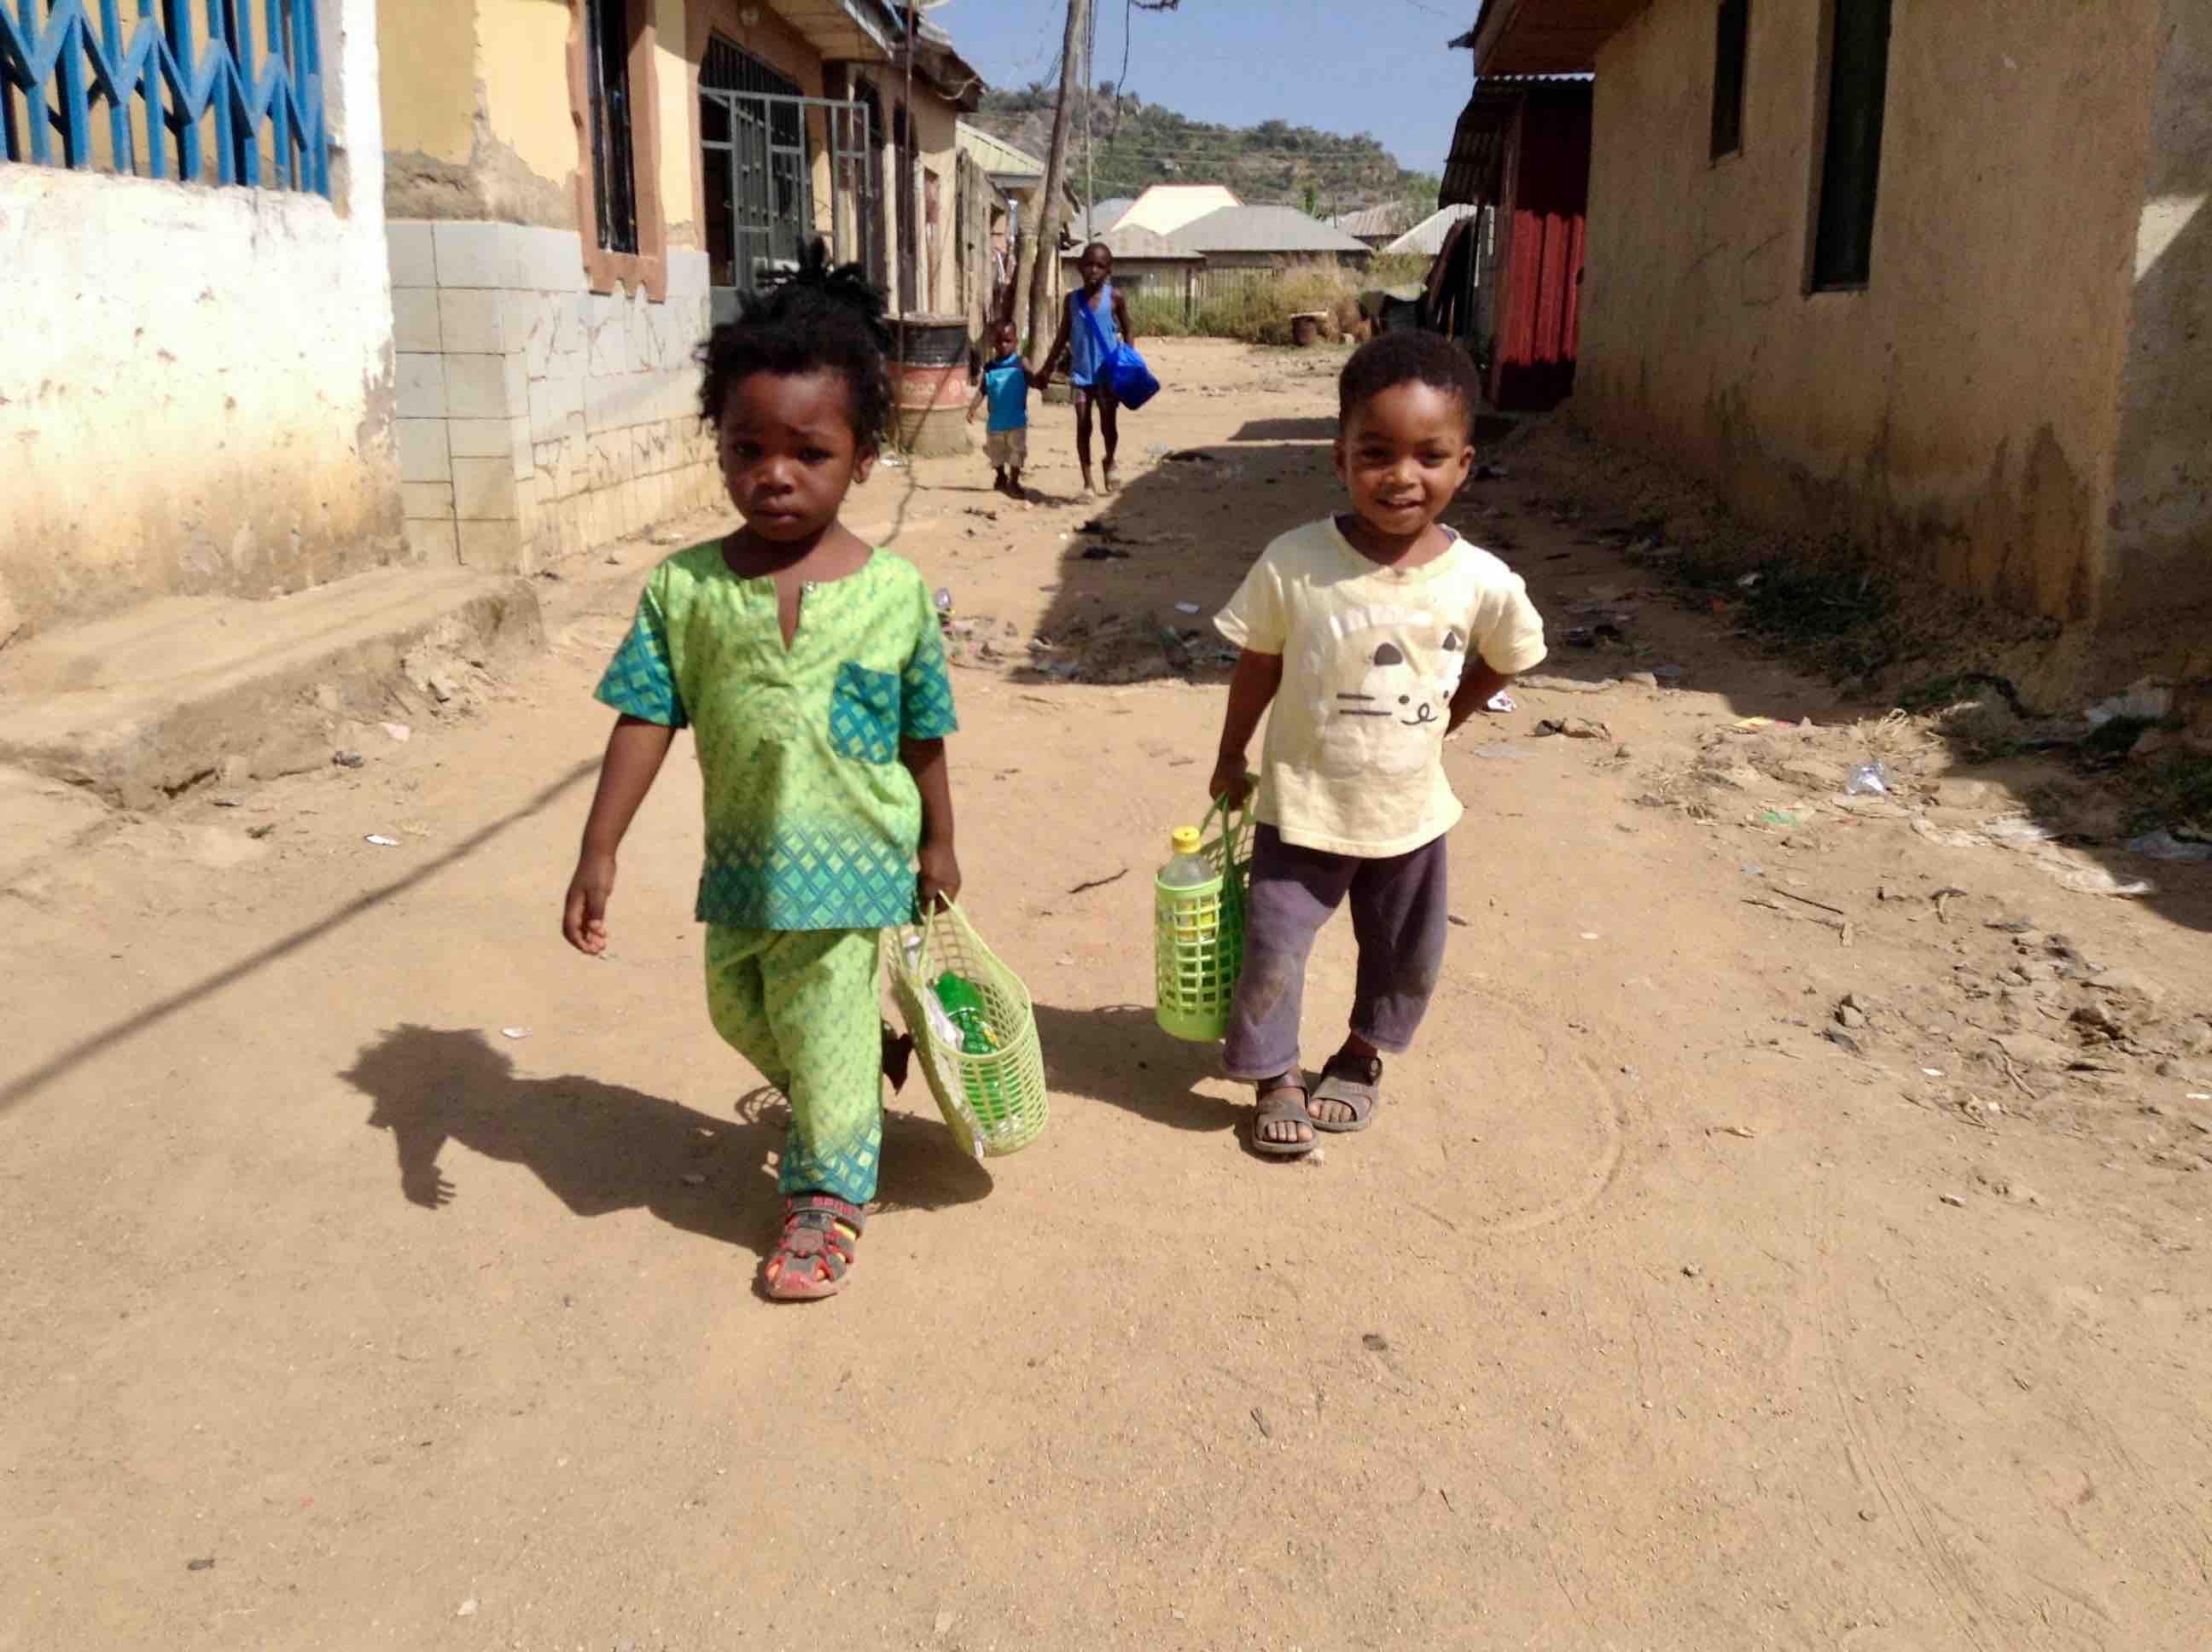 Two young boys, Ushafa Village, Abuja, Nigeria. #JujuFilms